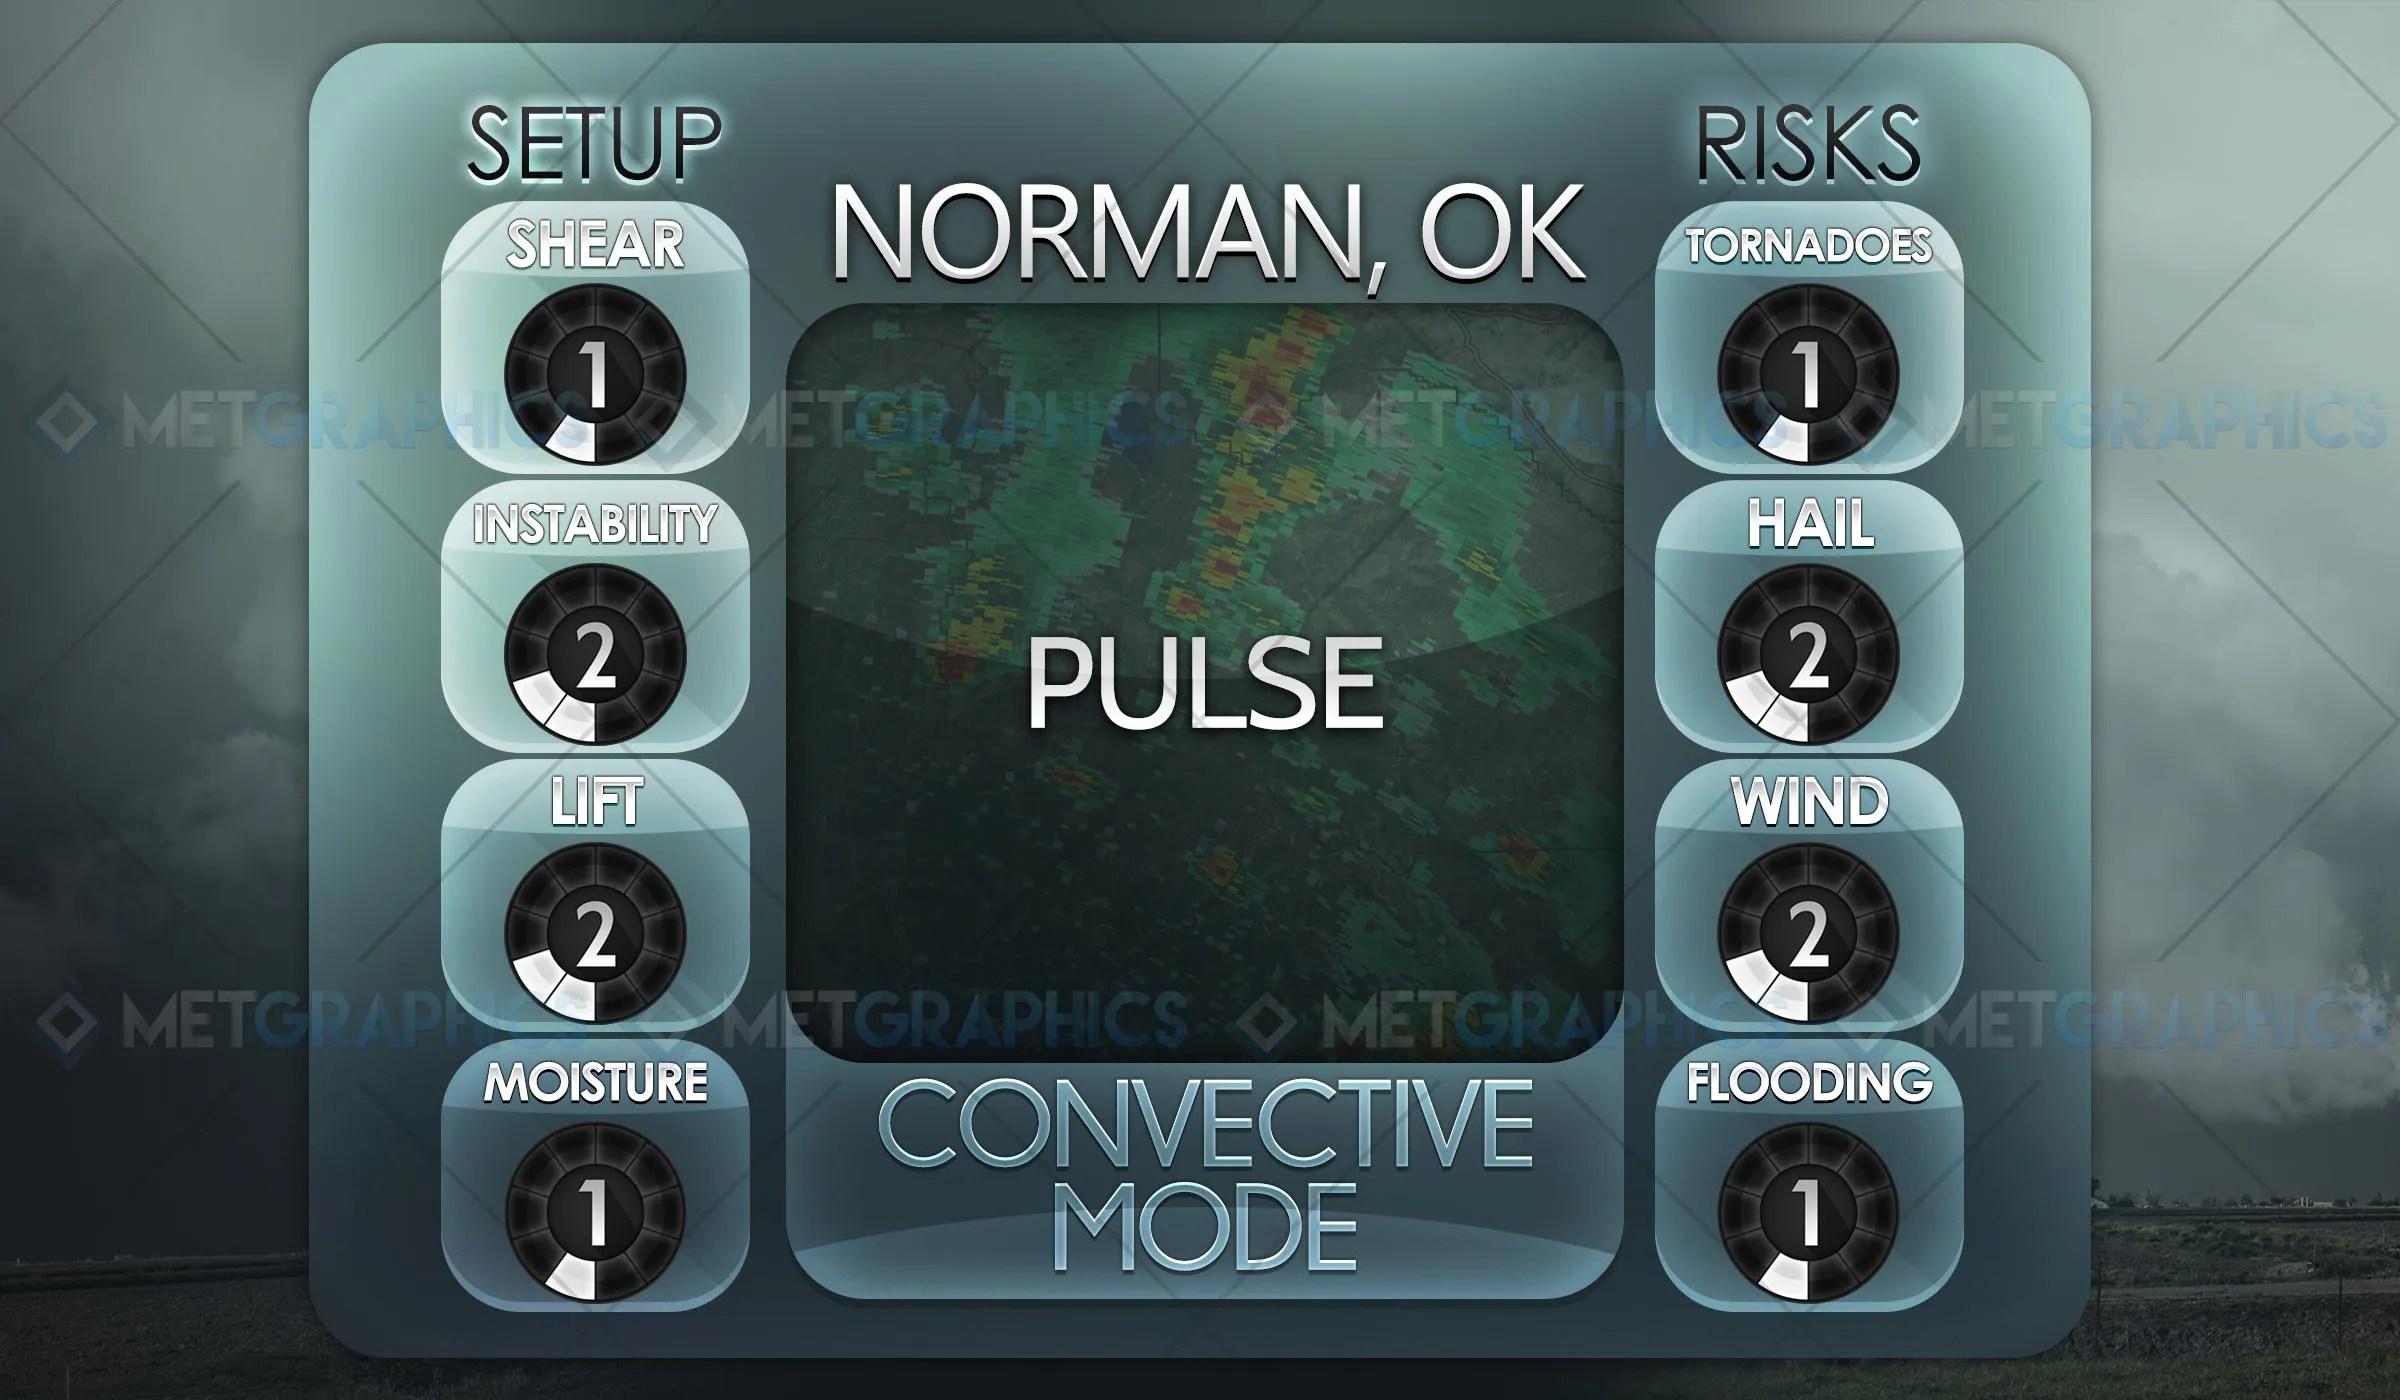 Convective Mode III: Pulse